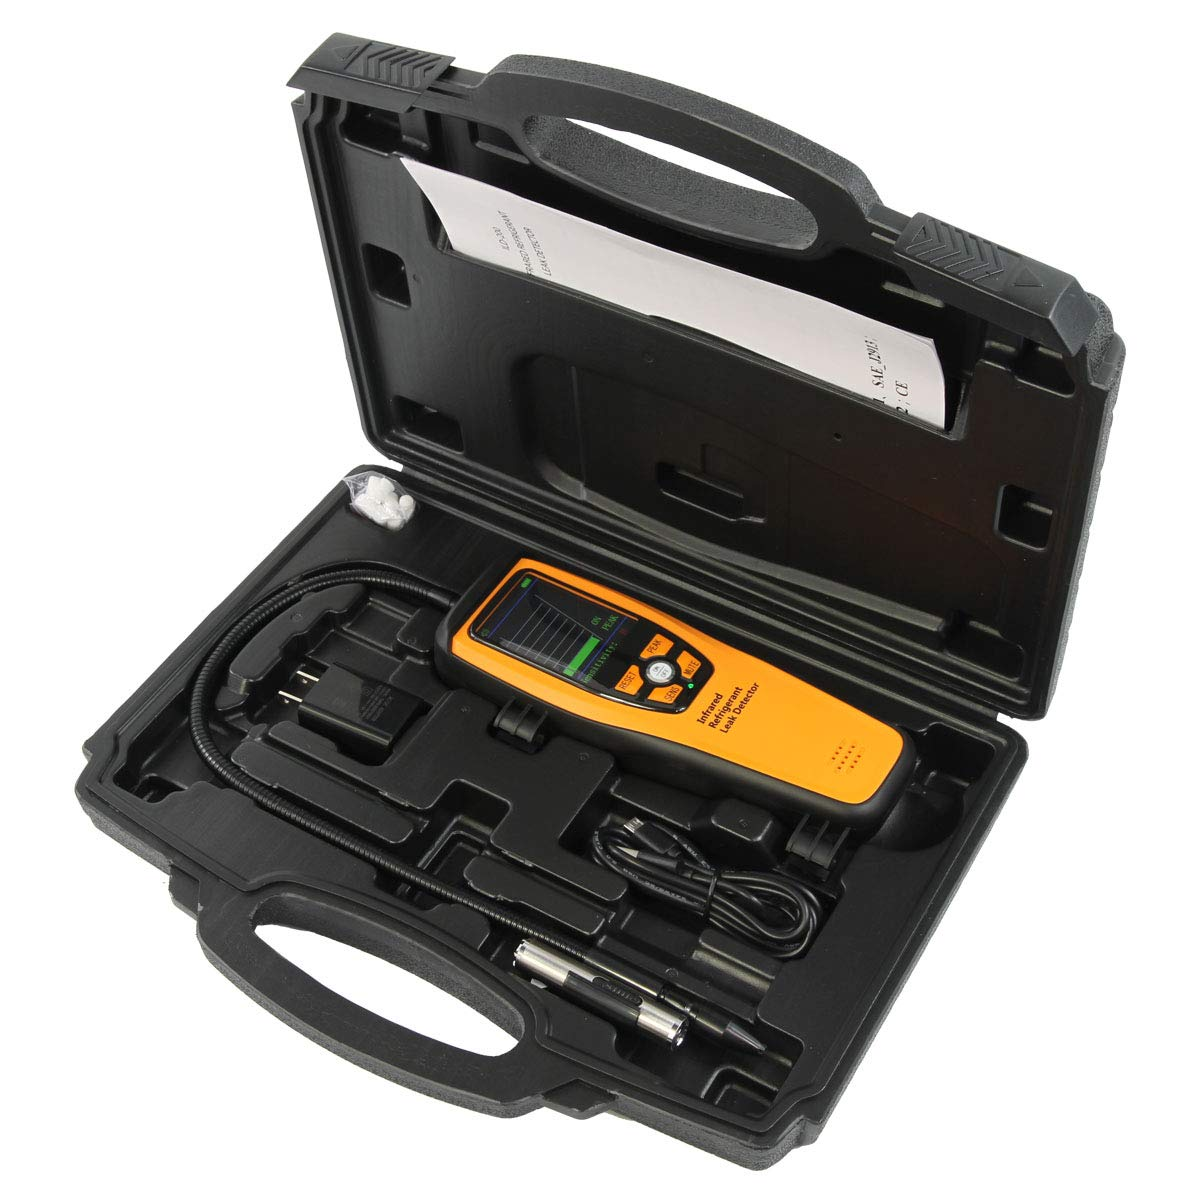 Elitech ILD-100 Advanced Refrigerant Leak Detector Halogen Leakage Tester Rechargeable 10 Years Life